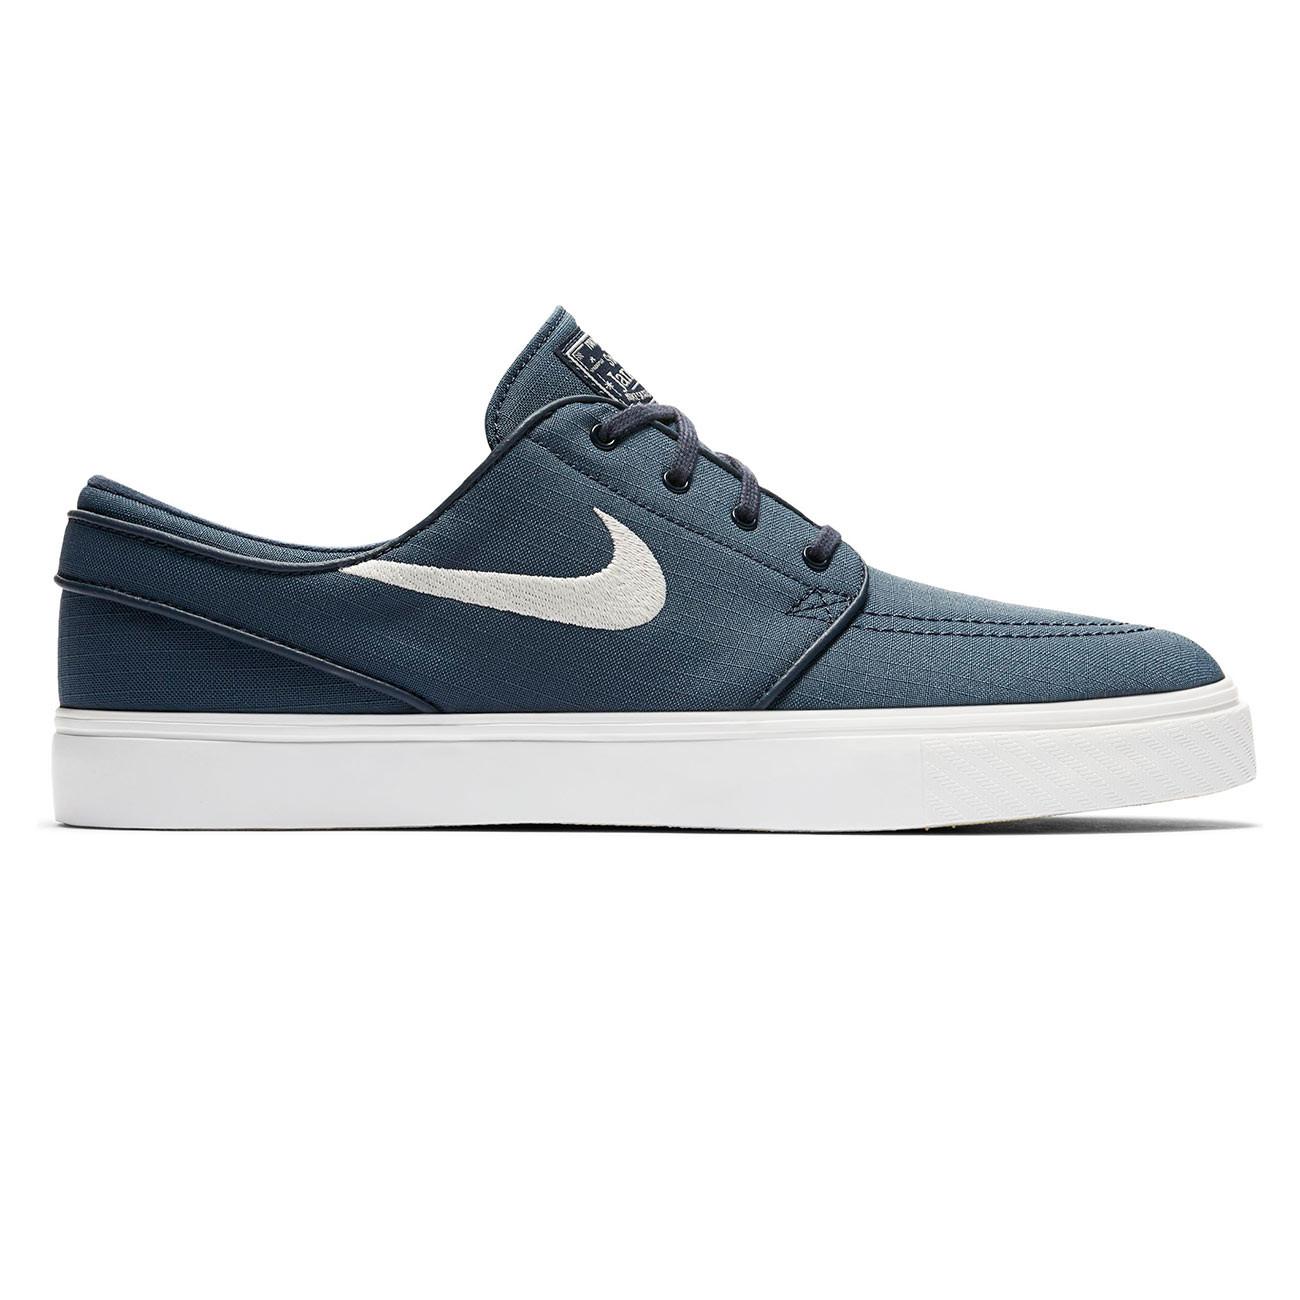 Tenisky Nike SB Zoom Stefan Janoski Canvas thndr blue/light bone-smmt white